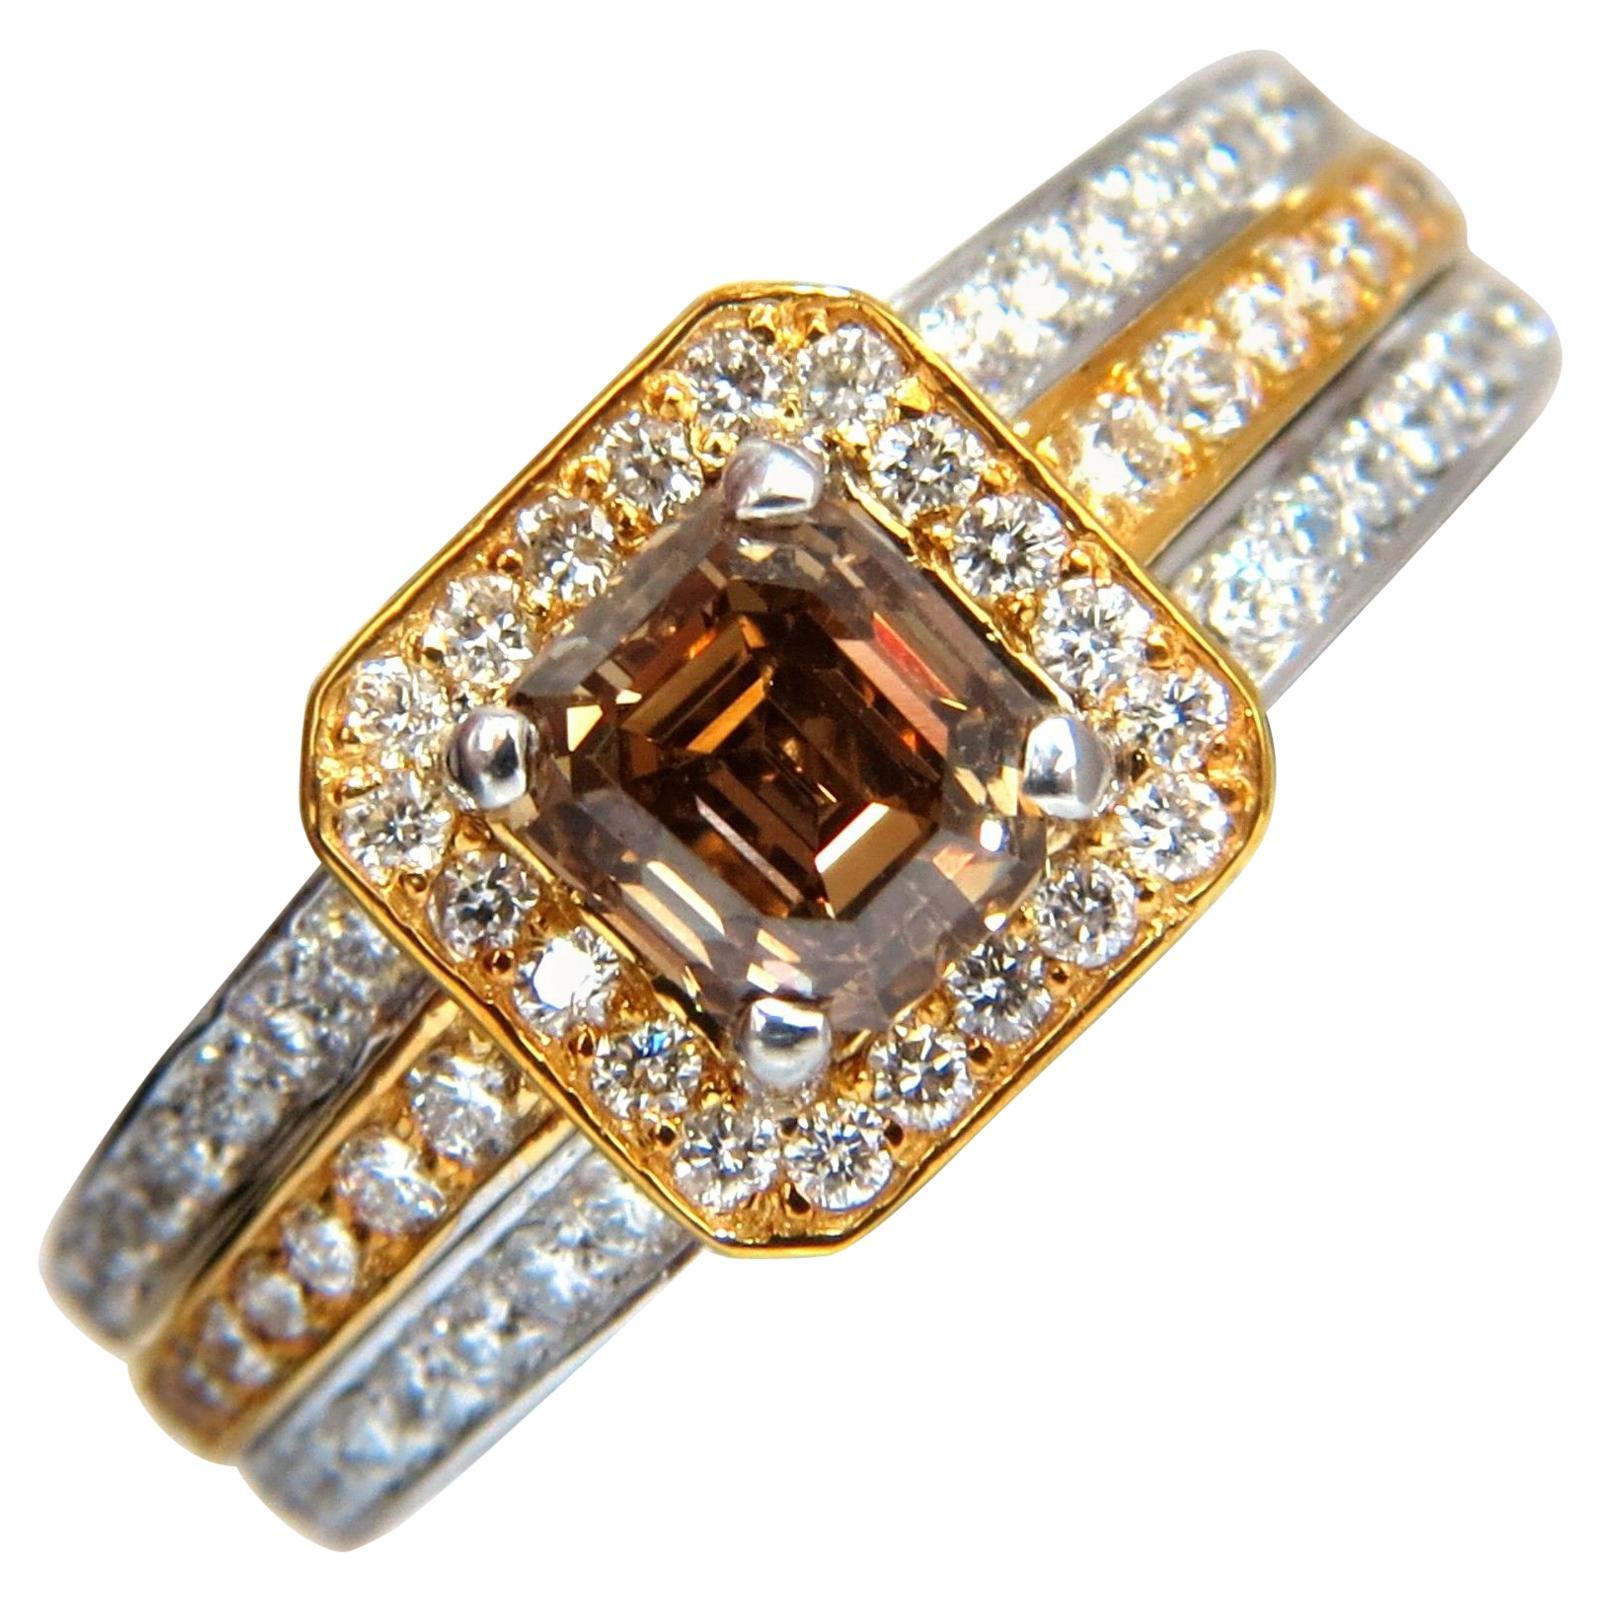 3.10 Carat Natural Fancy Yellow Brown Diamond Raised Halo Mod Deco Ring 14 Karat